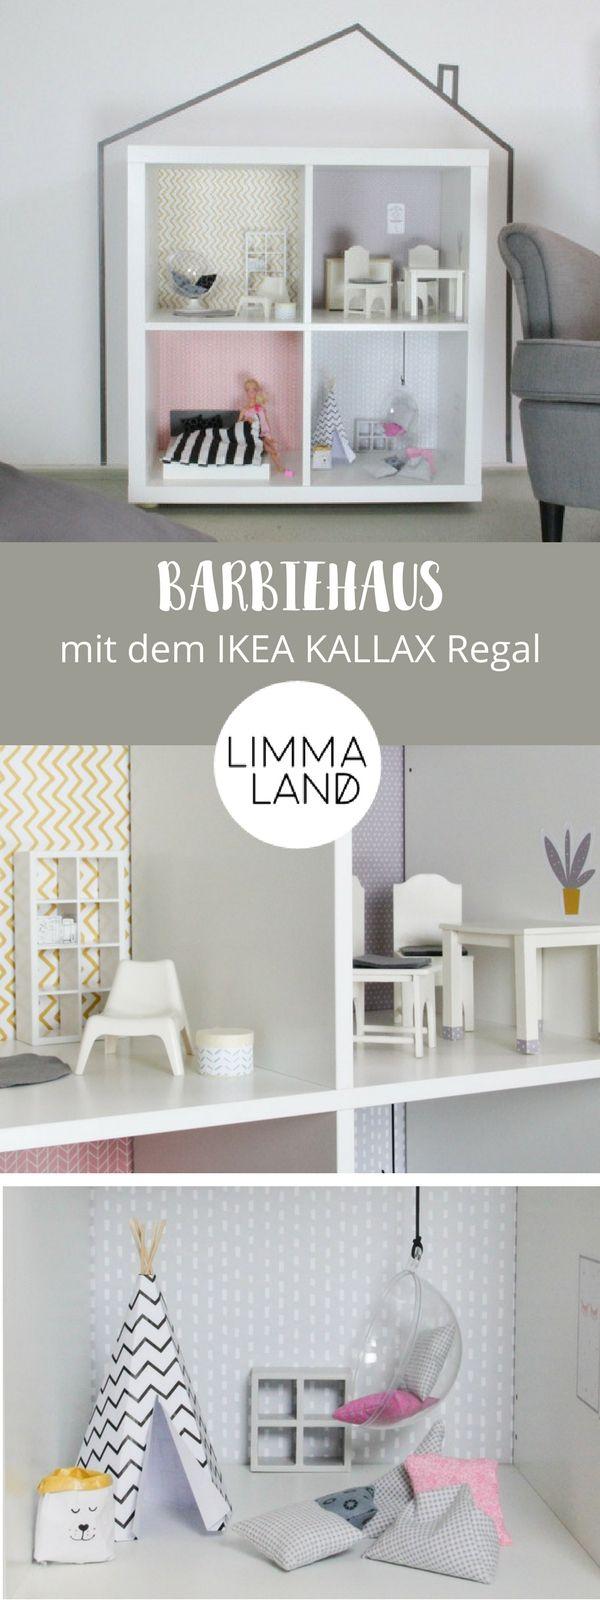 Wandfolie LILLE STUBA für Puppenhaus IKEA KALLAX Regal Rosa/Grau